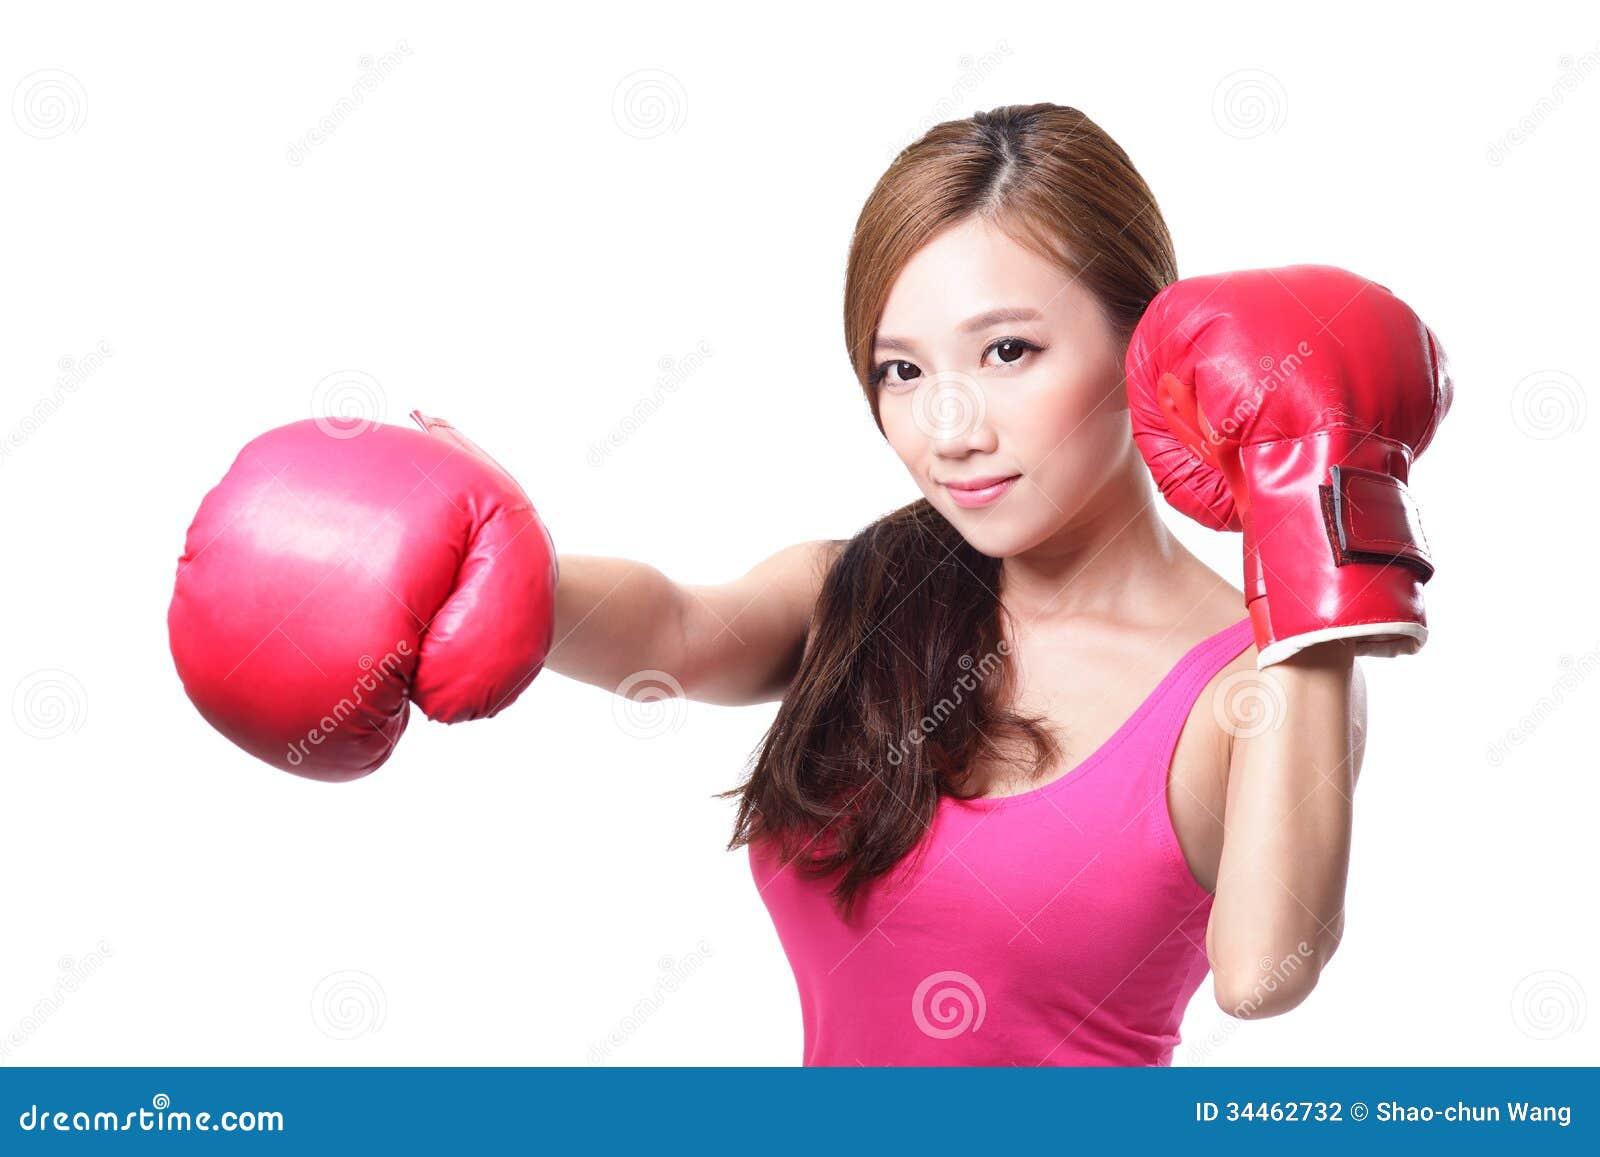 Asian girls boxing pity, that